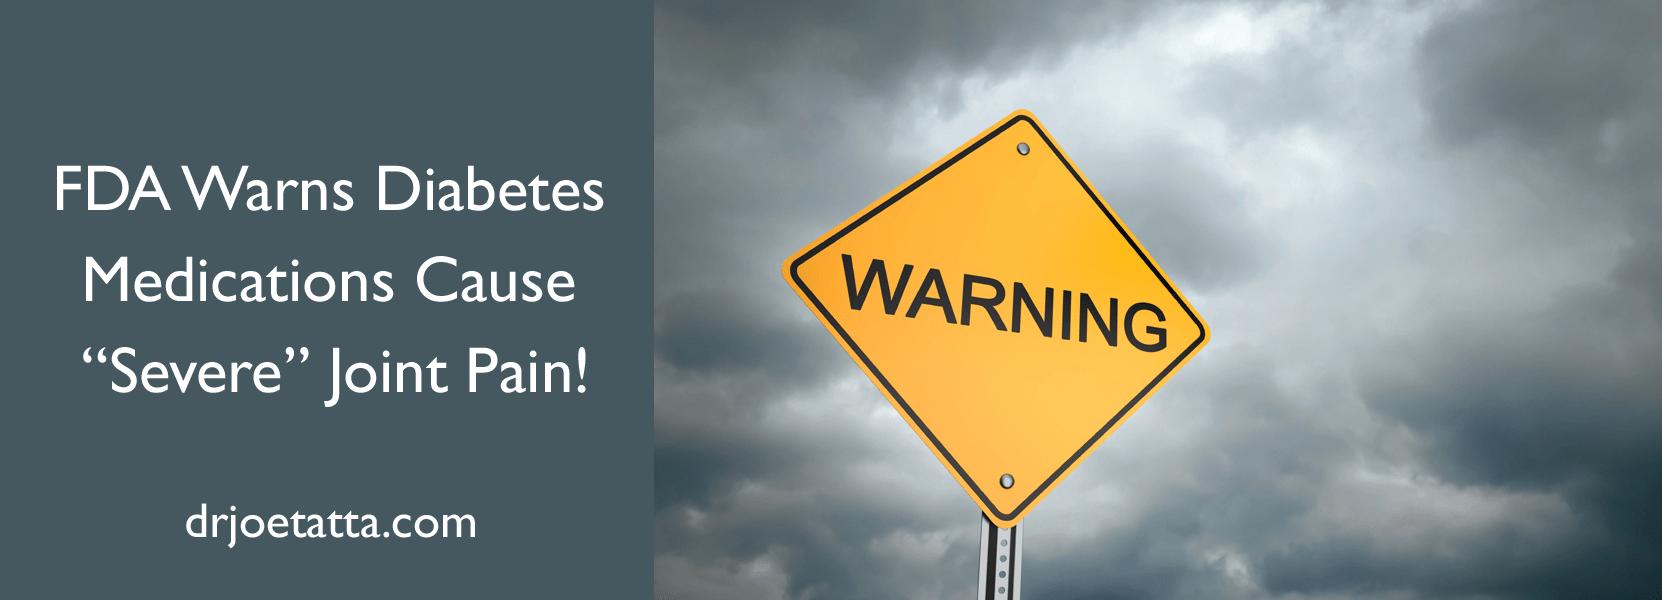 FDA-Warns-Diabetes_health2